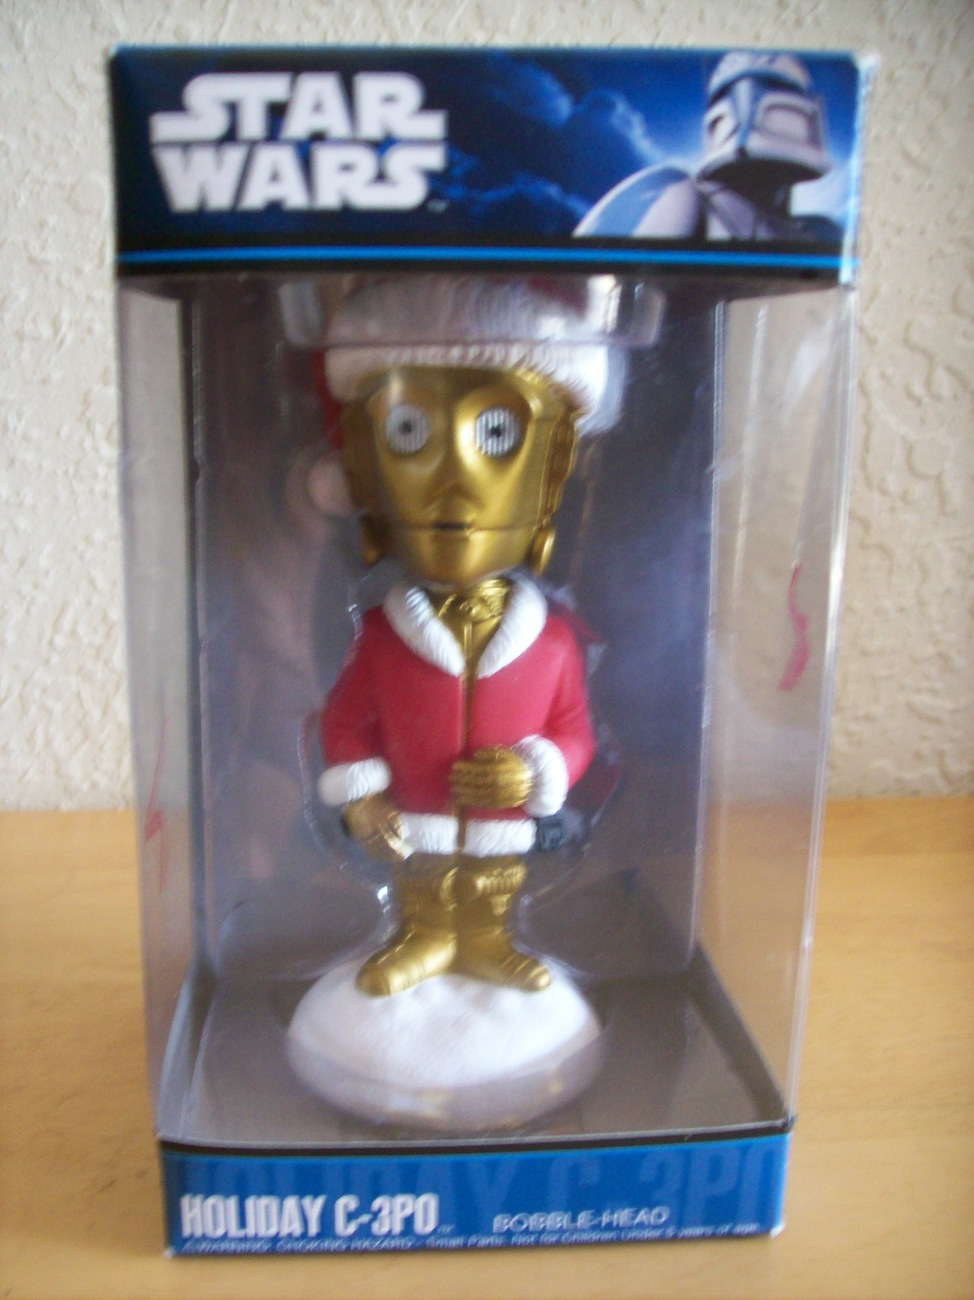 2010 Star Wars Holiday C-3PO Bobble-Head Figurine